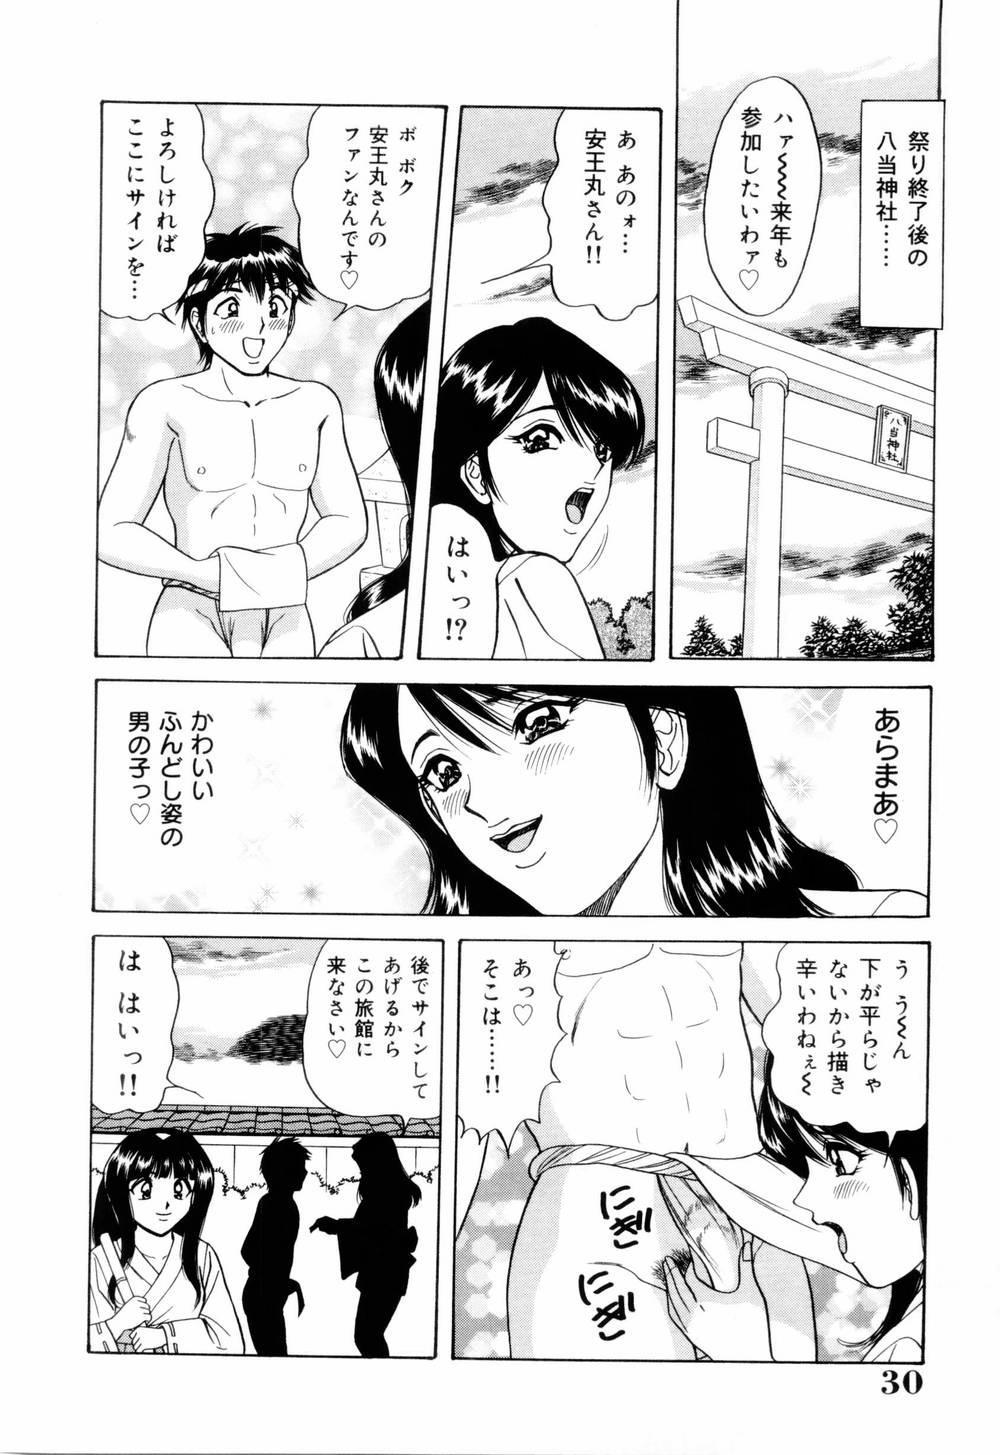 SuiCup Joshi Announcer Jikkyo Chukei Rape 33